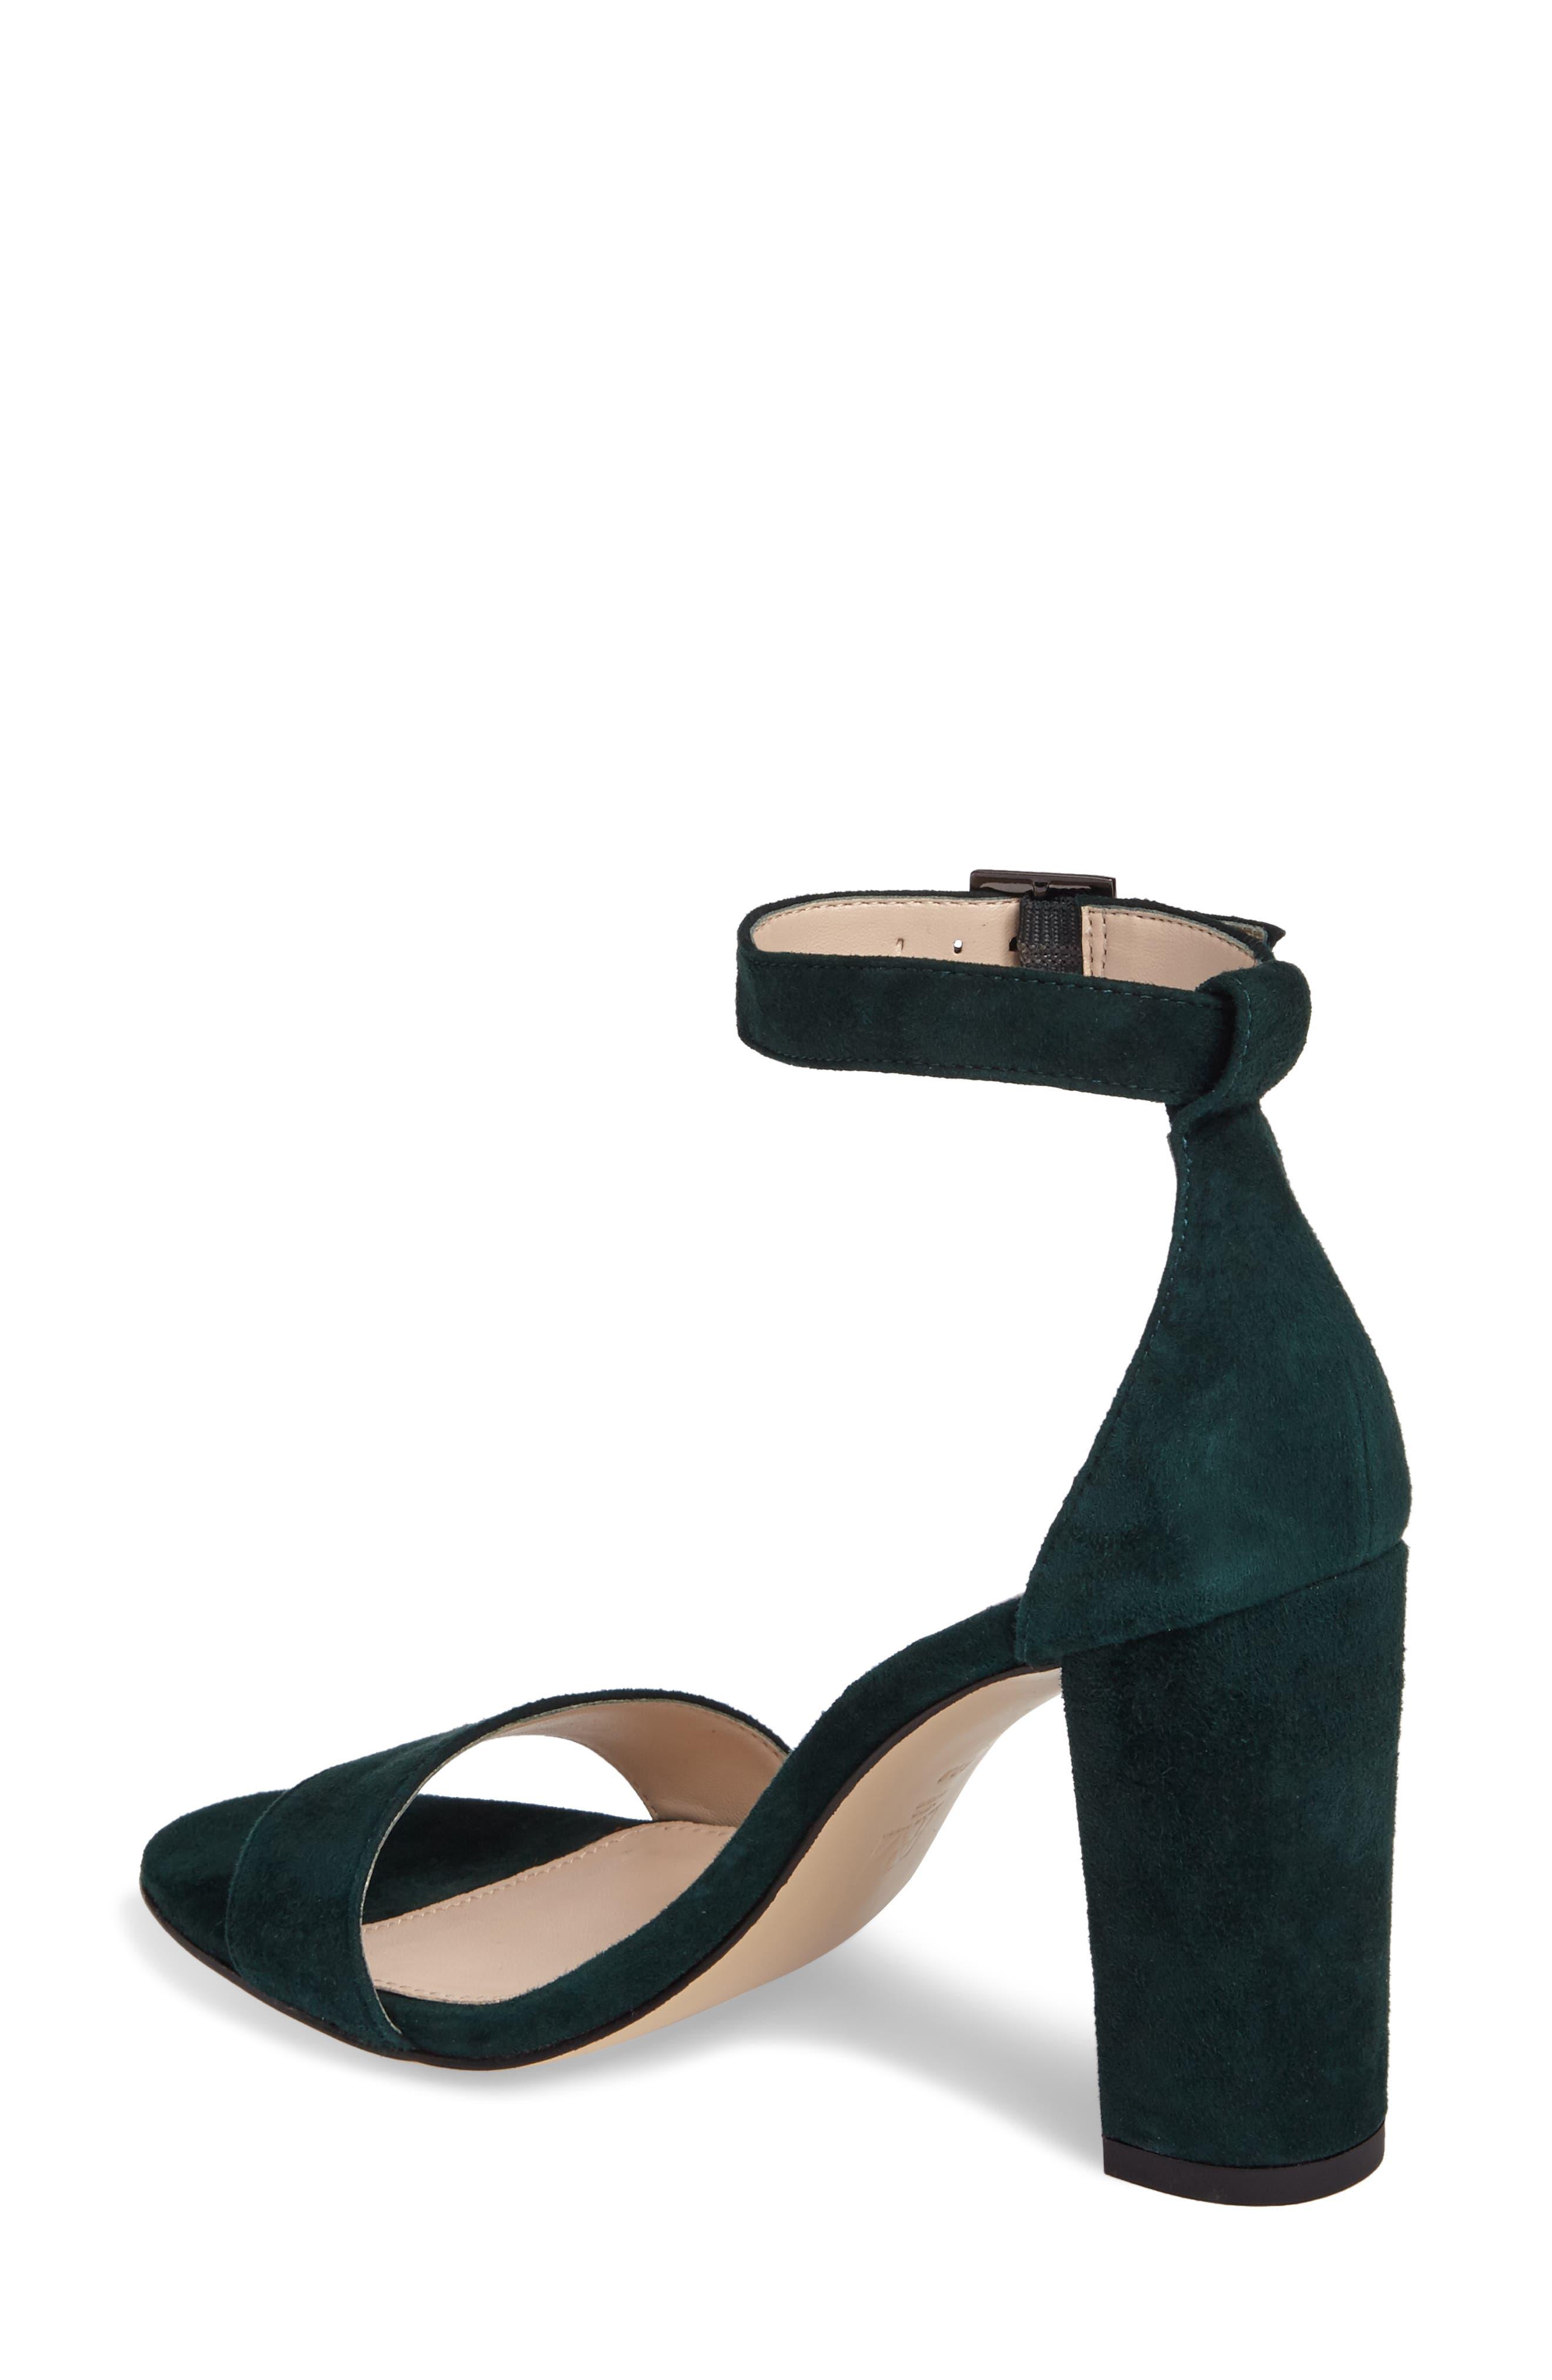 Bonnie Ankle Strap Sandal,                             Alternate thumbnail 2, color,                             Forest Leather